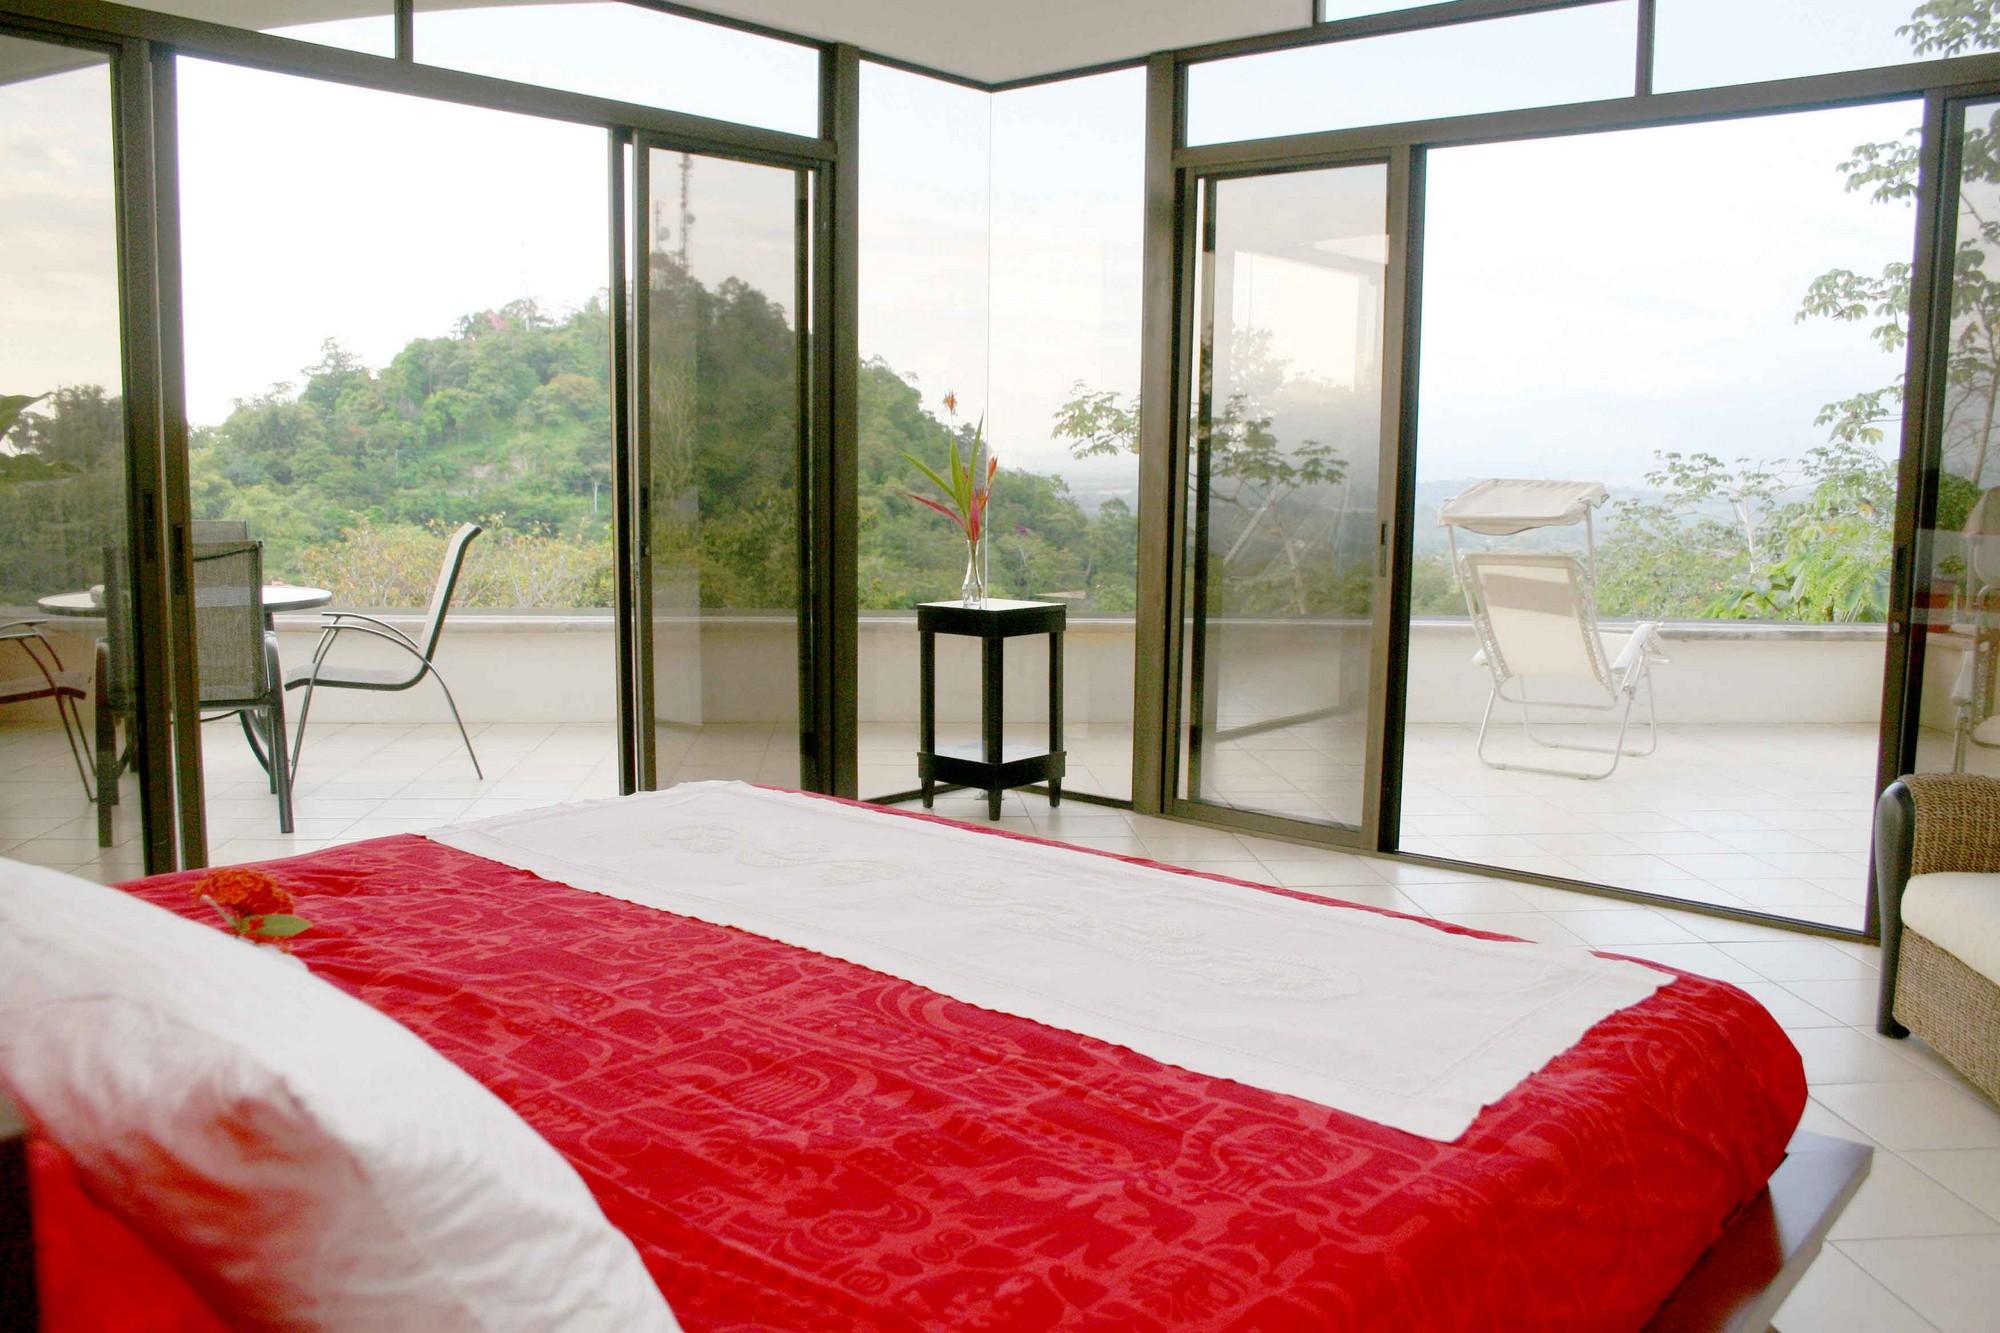 Casa de las Cascadas, Manuel Antonio, Costa Rica Huge, 20-foot windows to watch the sunset...